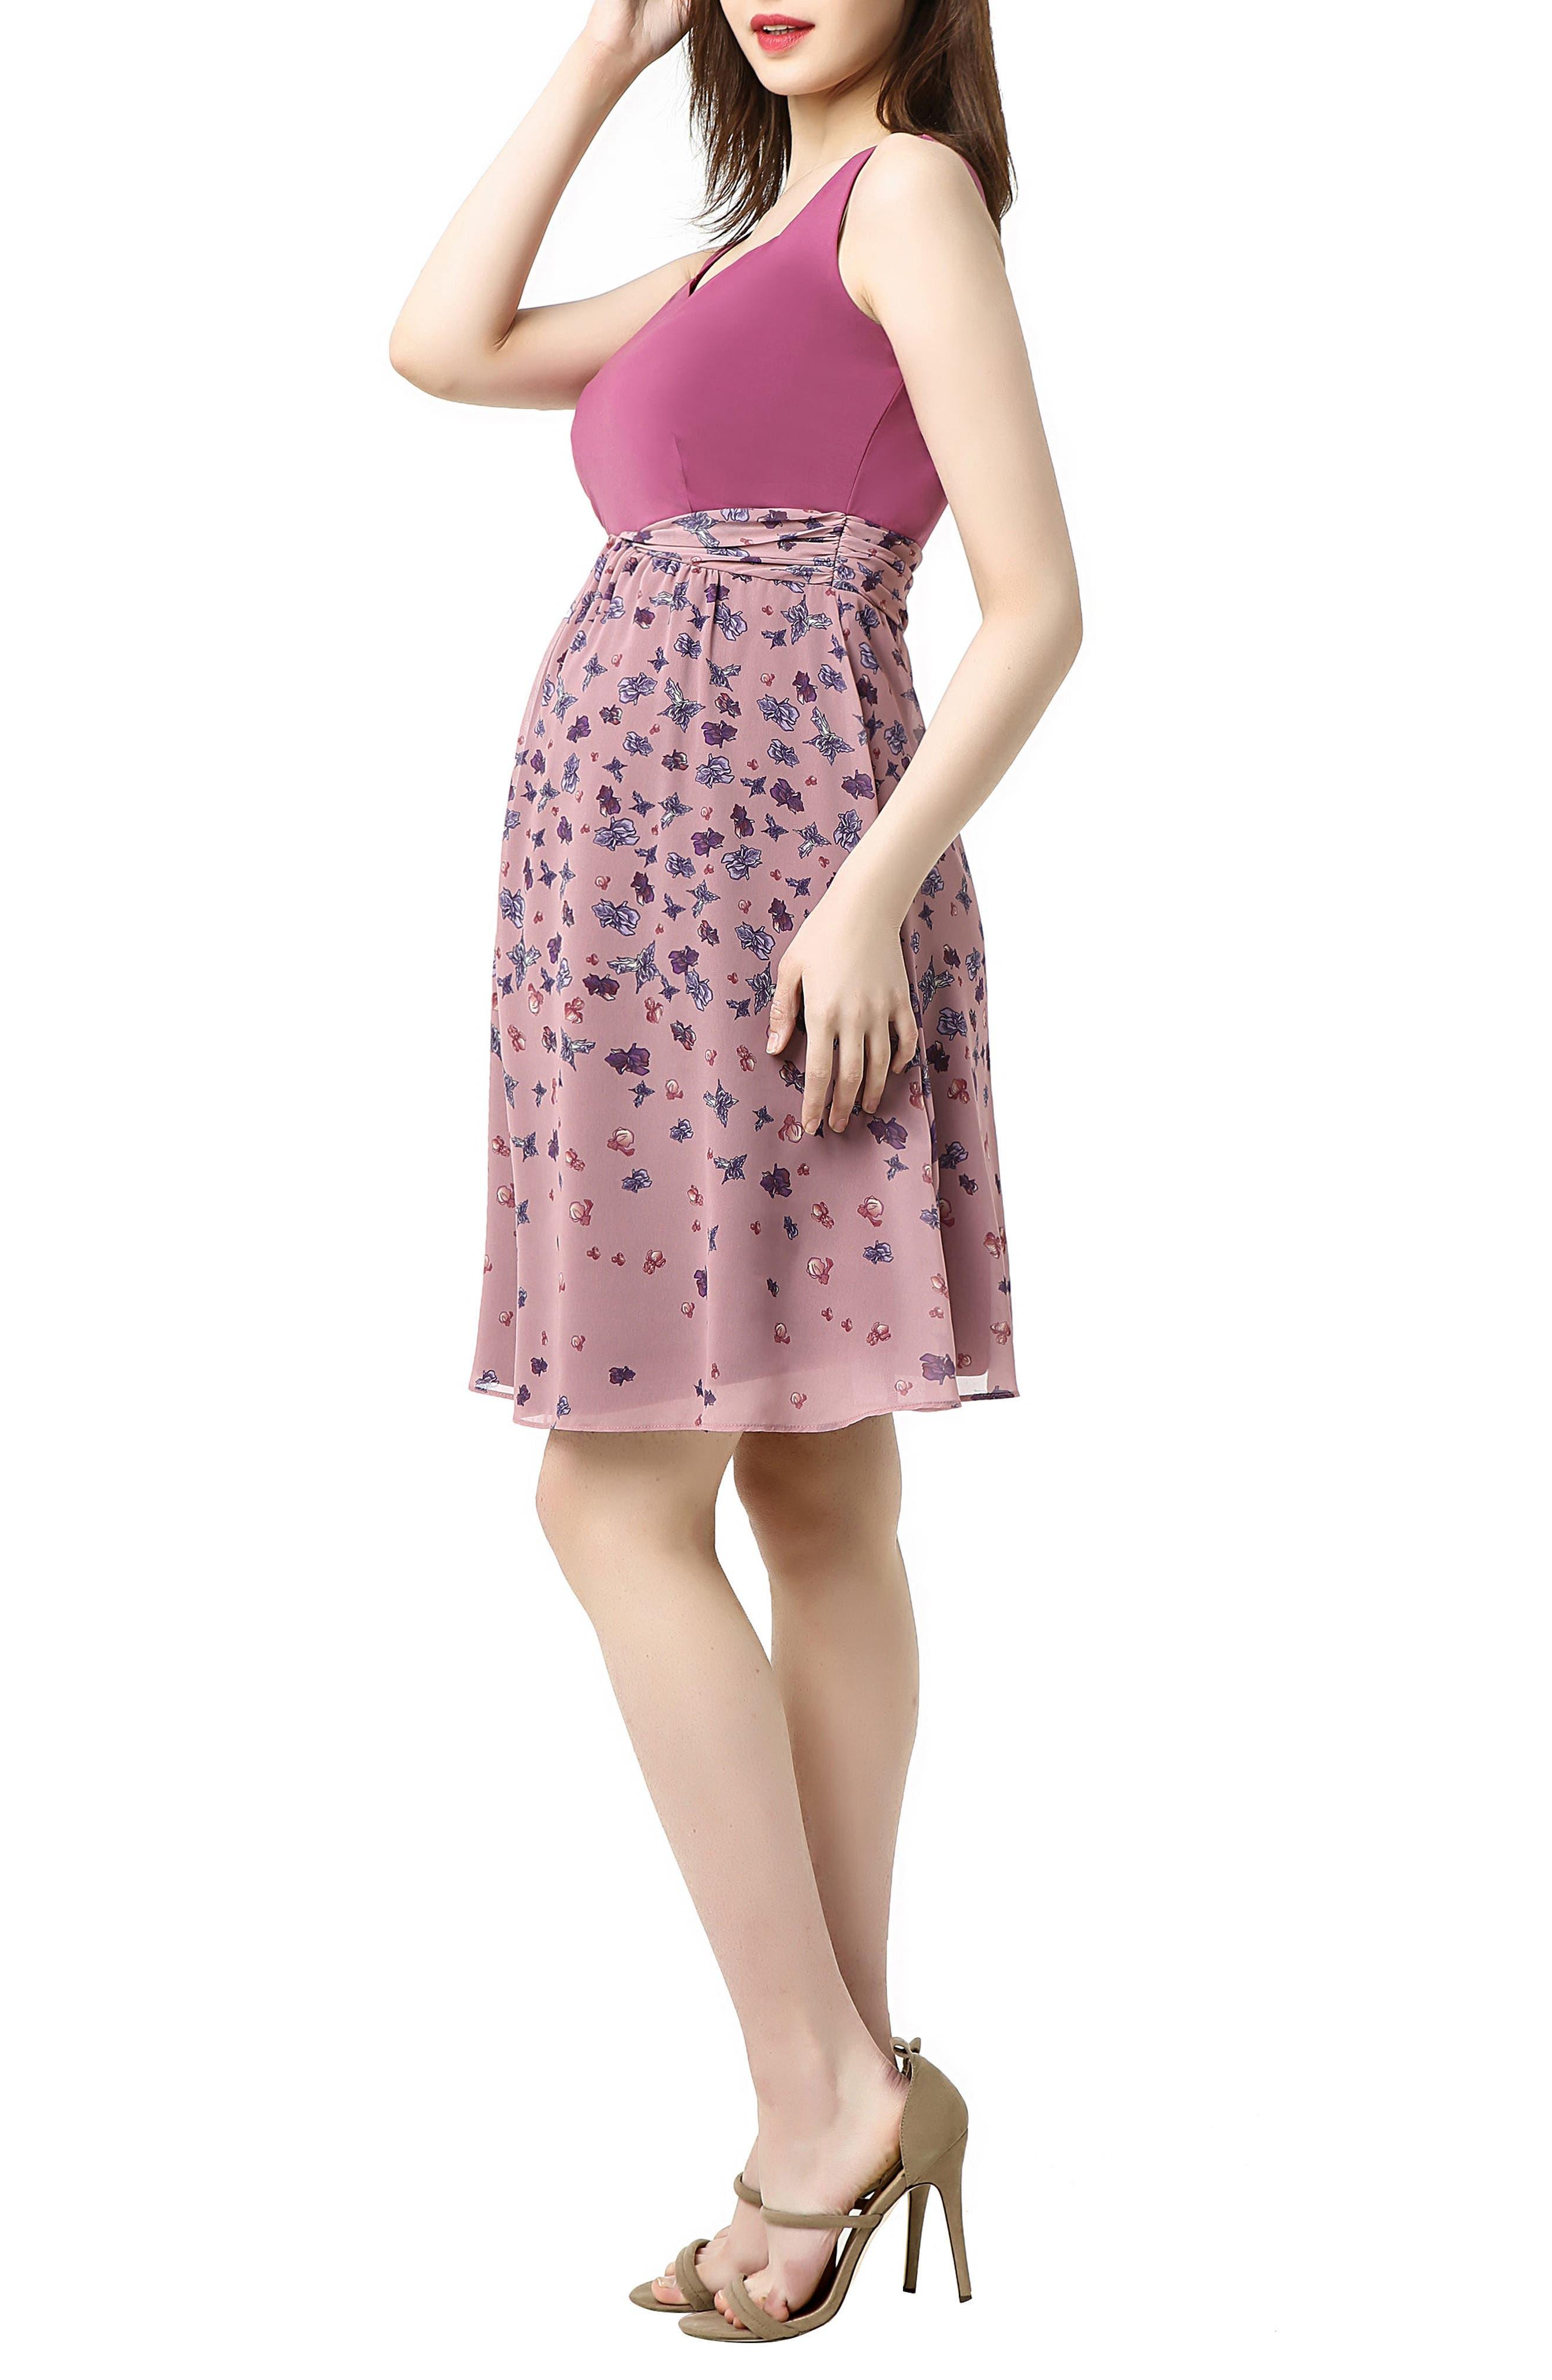 Libby Print Skirt Maternity Dress,                             Alternate thumbnail 3, color,                             ROSE PINK